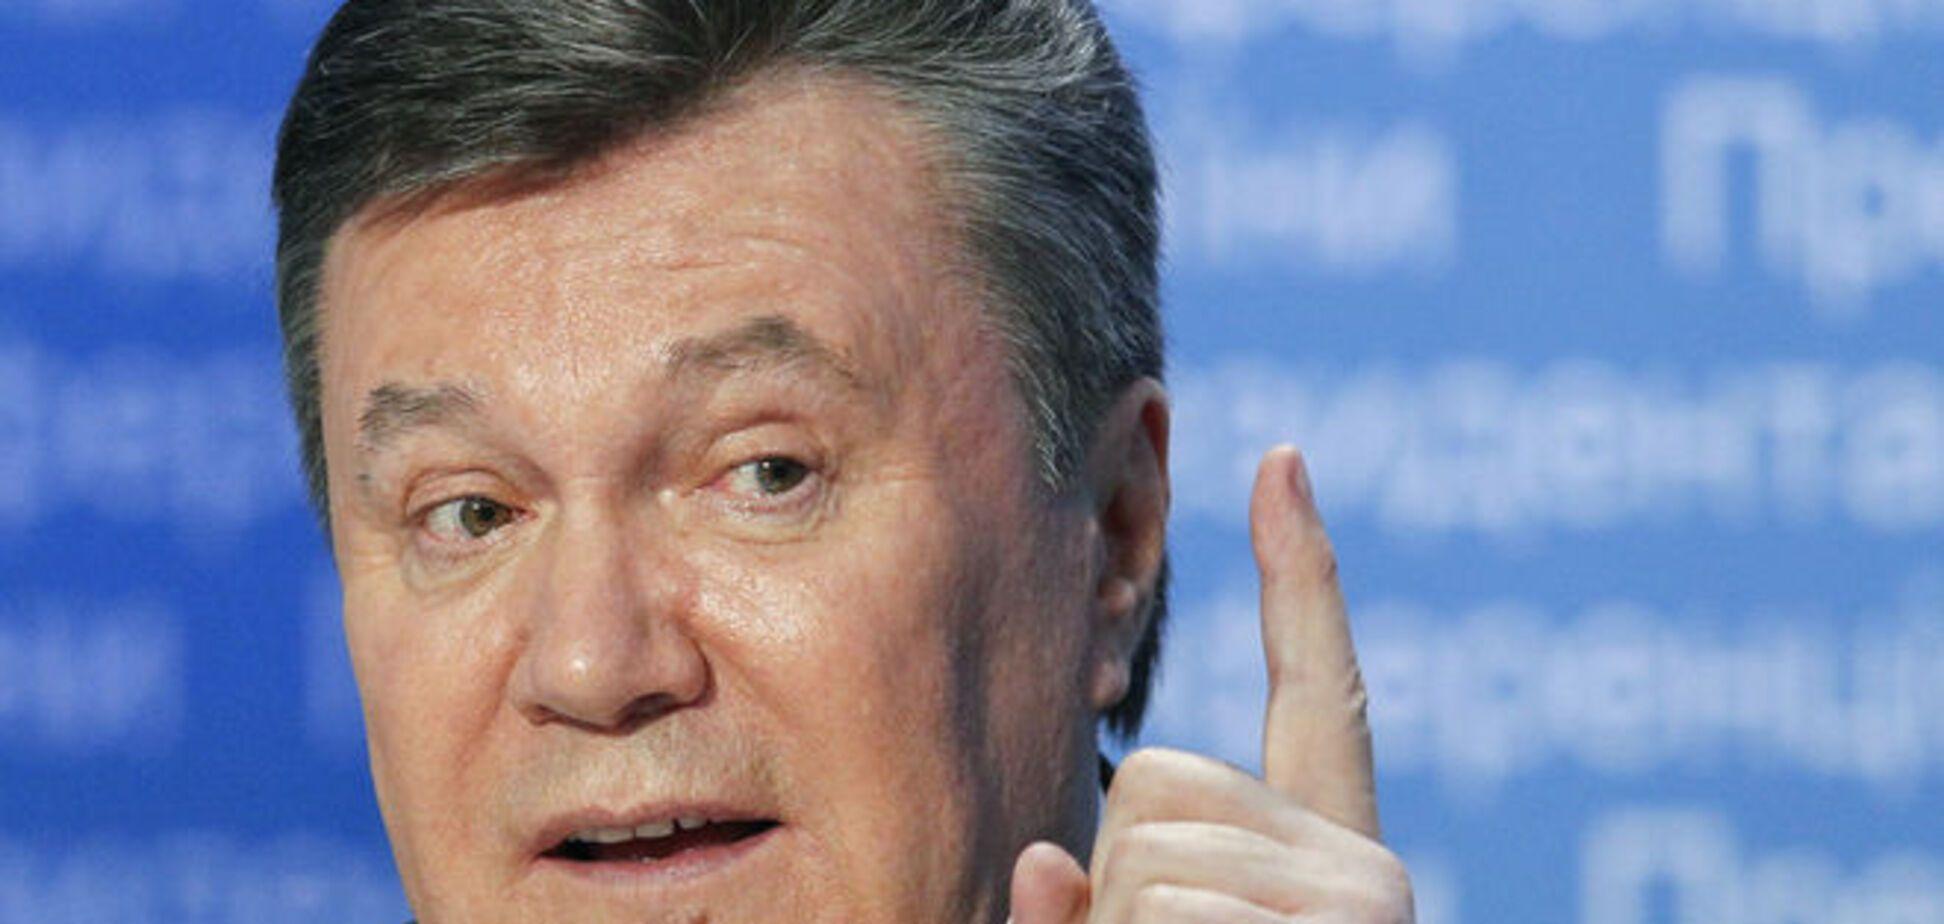 'Казаки' собрались вернуть Украине 'легитимного Януковича': опубликовано видео